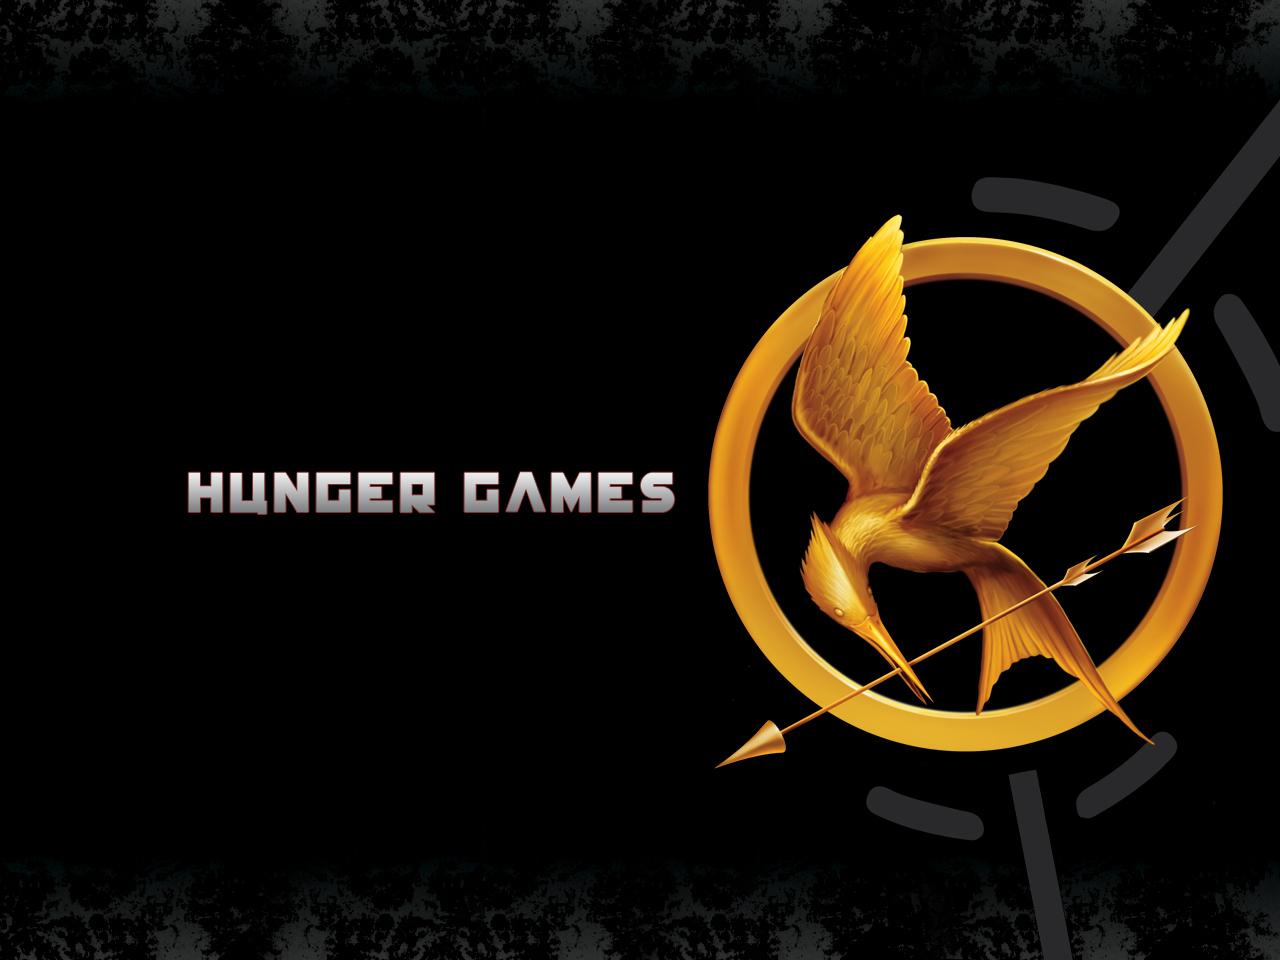 http://2.bp.blogspot.com/-Lpo1I1qYZMs/T2iZq4H8TPI/AAAAAAAABJI/LAbL_w_EnIk/s1600/The-Hunger-Games-the-hunger-game-trilogy-2624991-1280-960.jpg